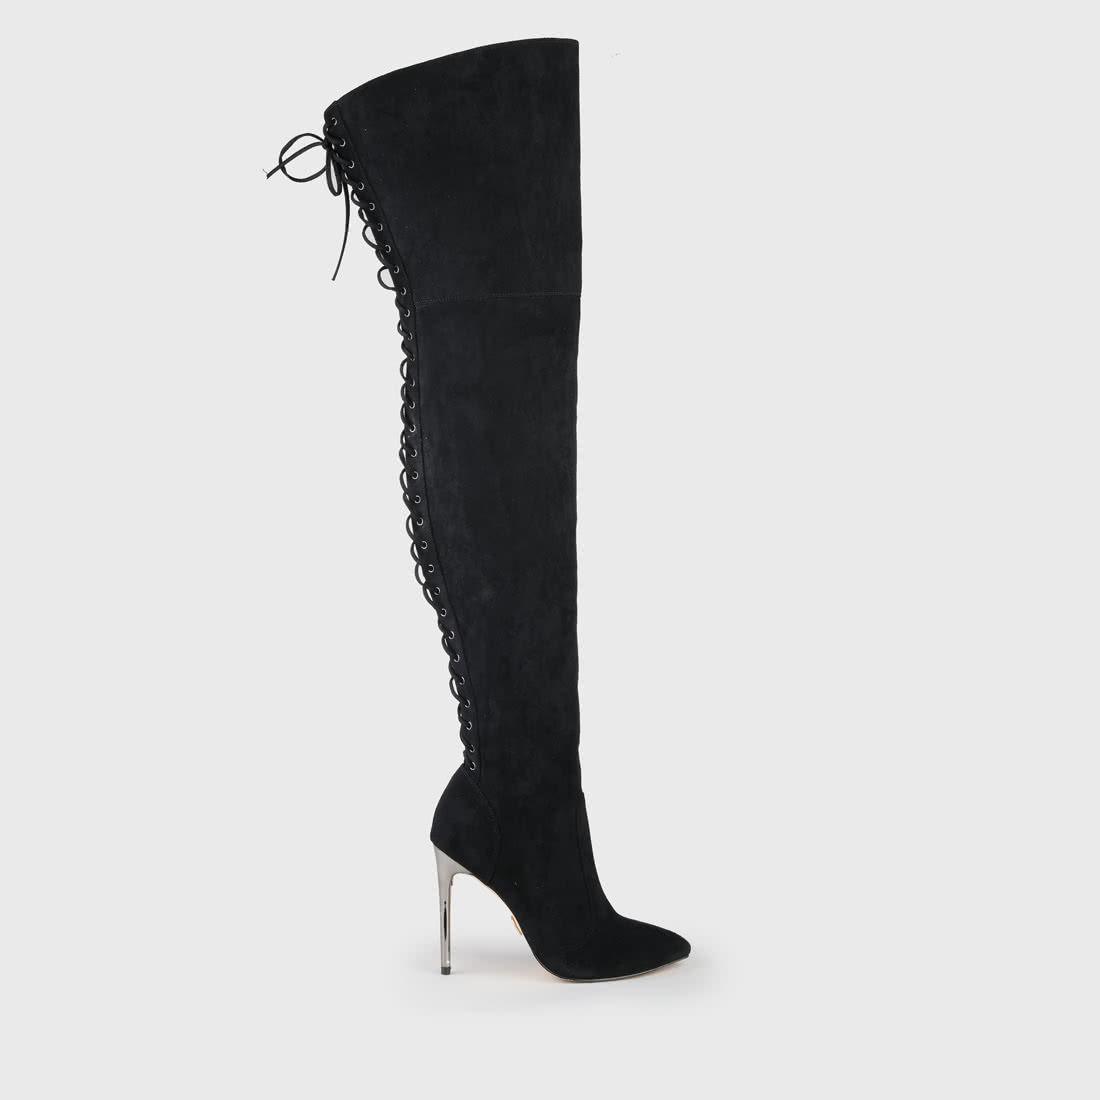 Fiete Overknee Boots Suede Look Black buy online in BUFFALO